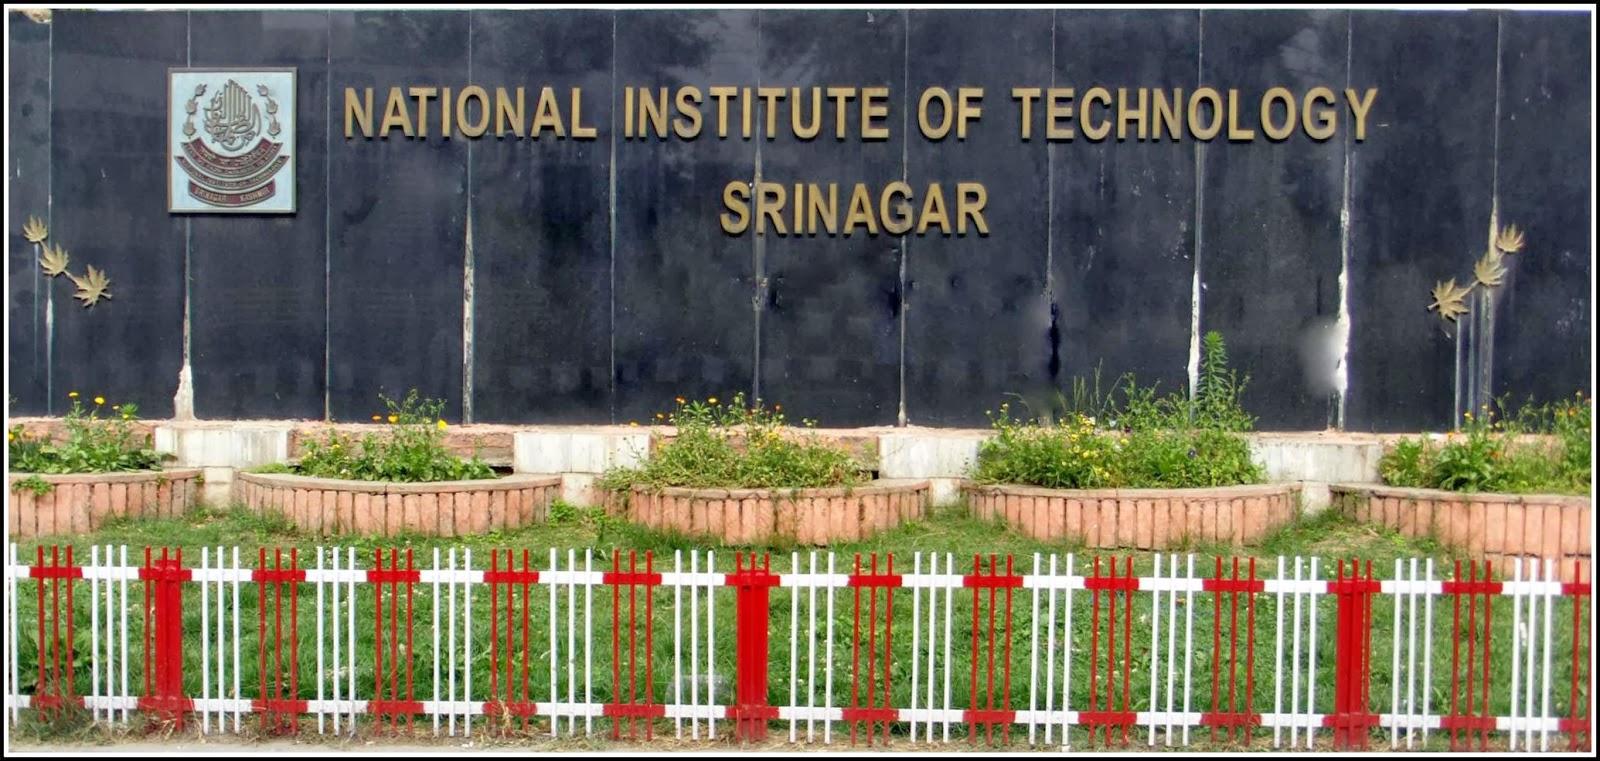 neeraj khandal from nit srinagar